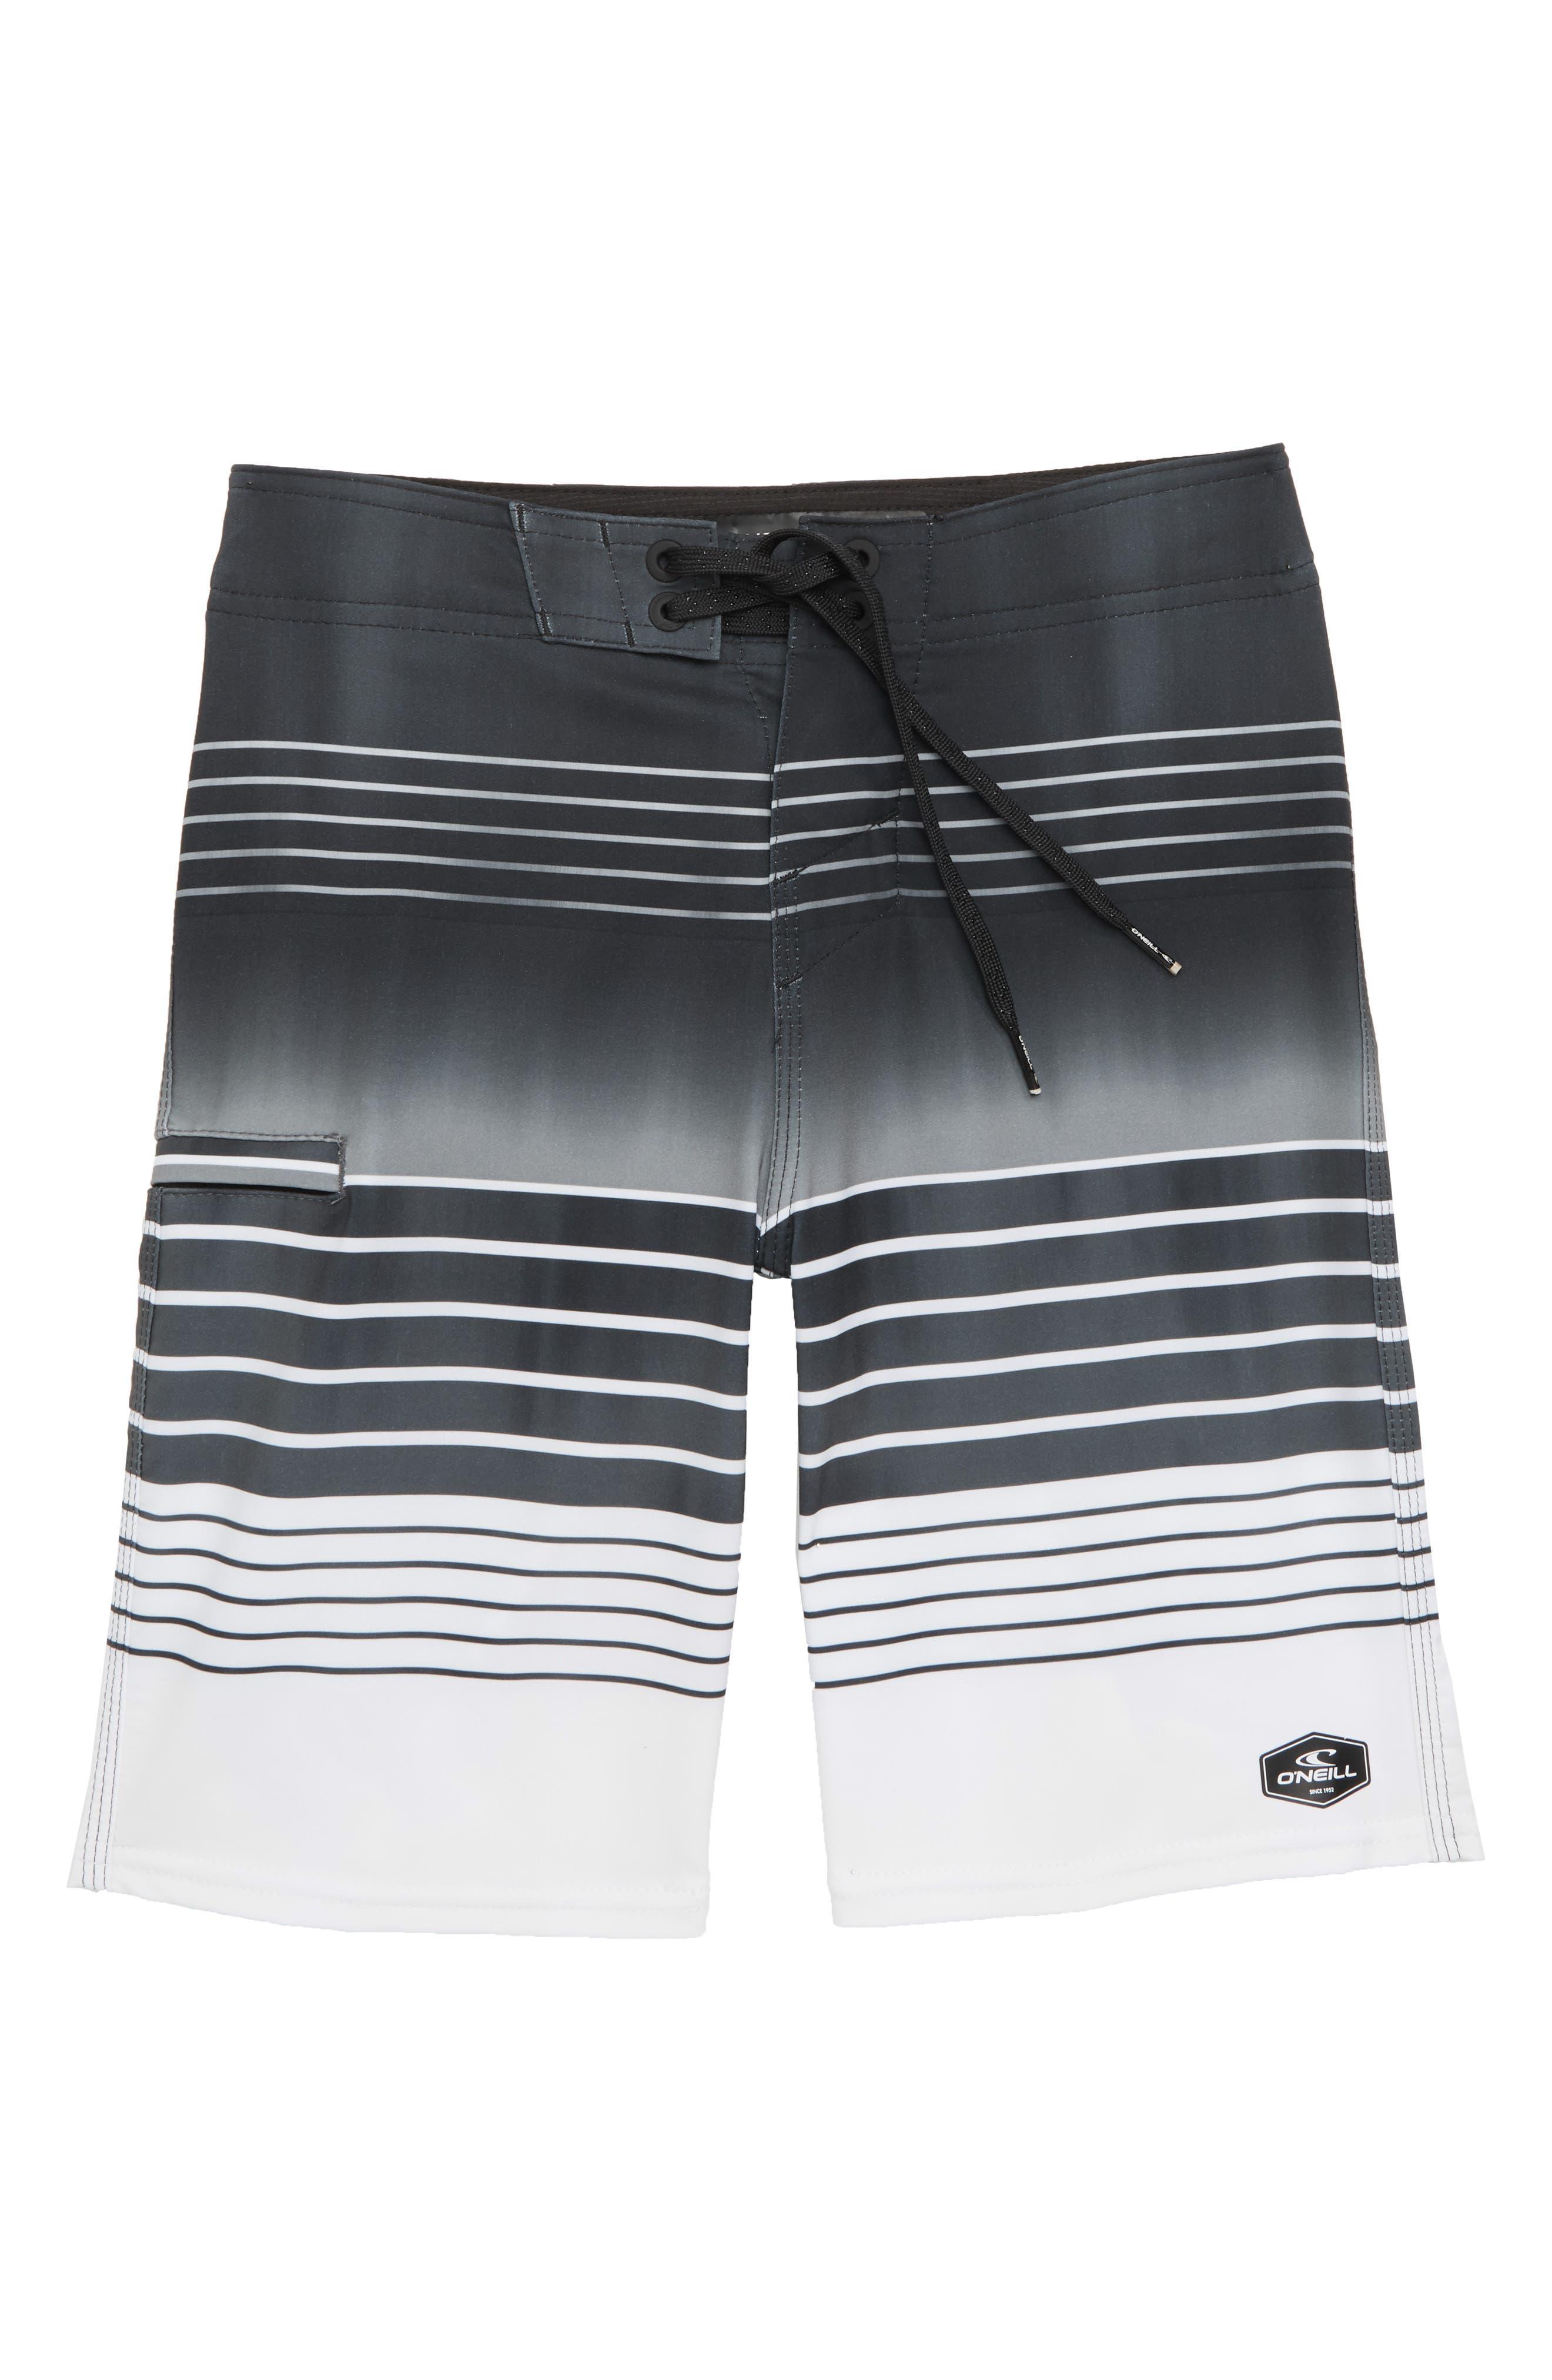 Hyperfreak Heist Board Shorts,                             Main thumbnail 1, color,                             Black